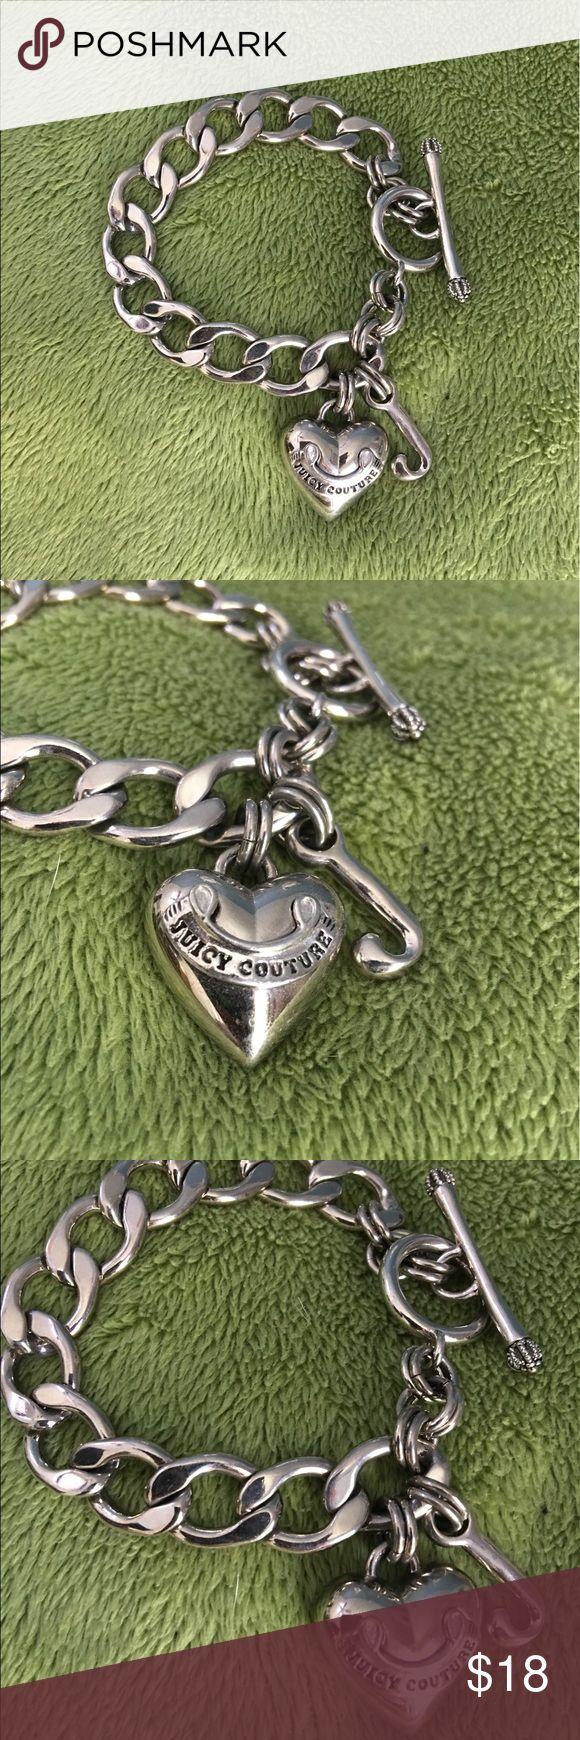 Juicy Couture Silver Finish Charm Bracelet